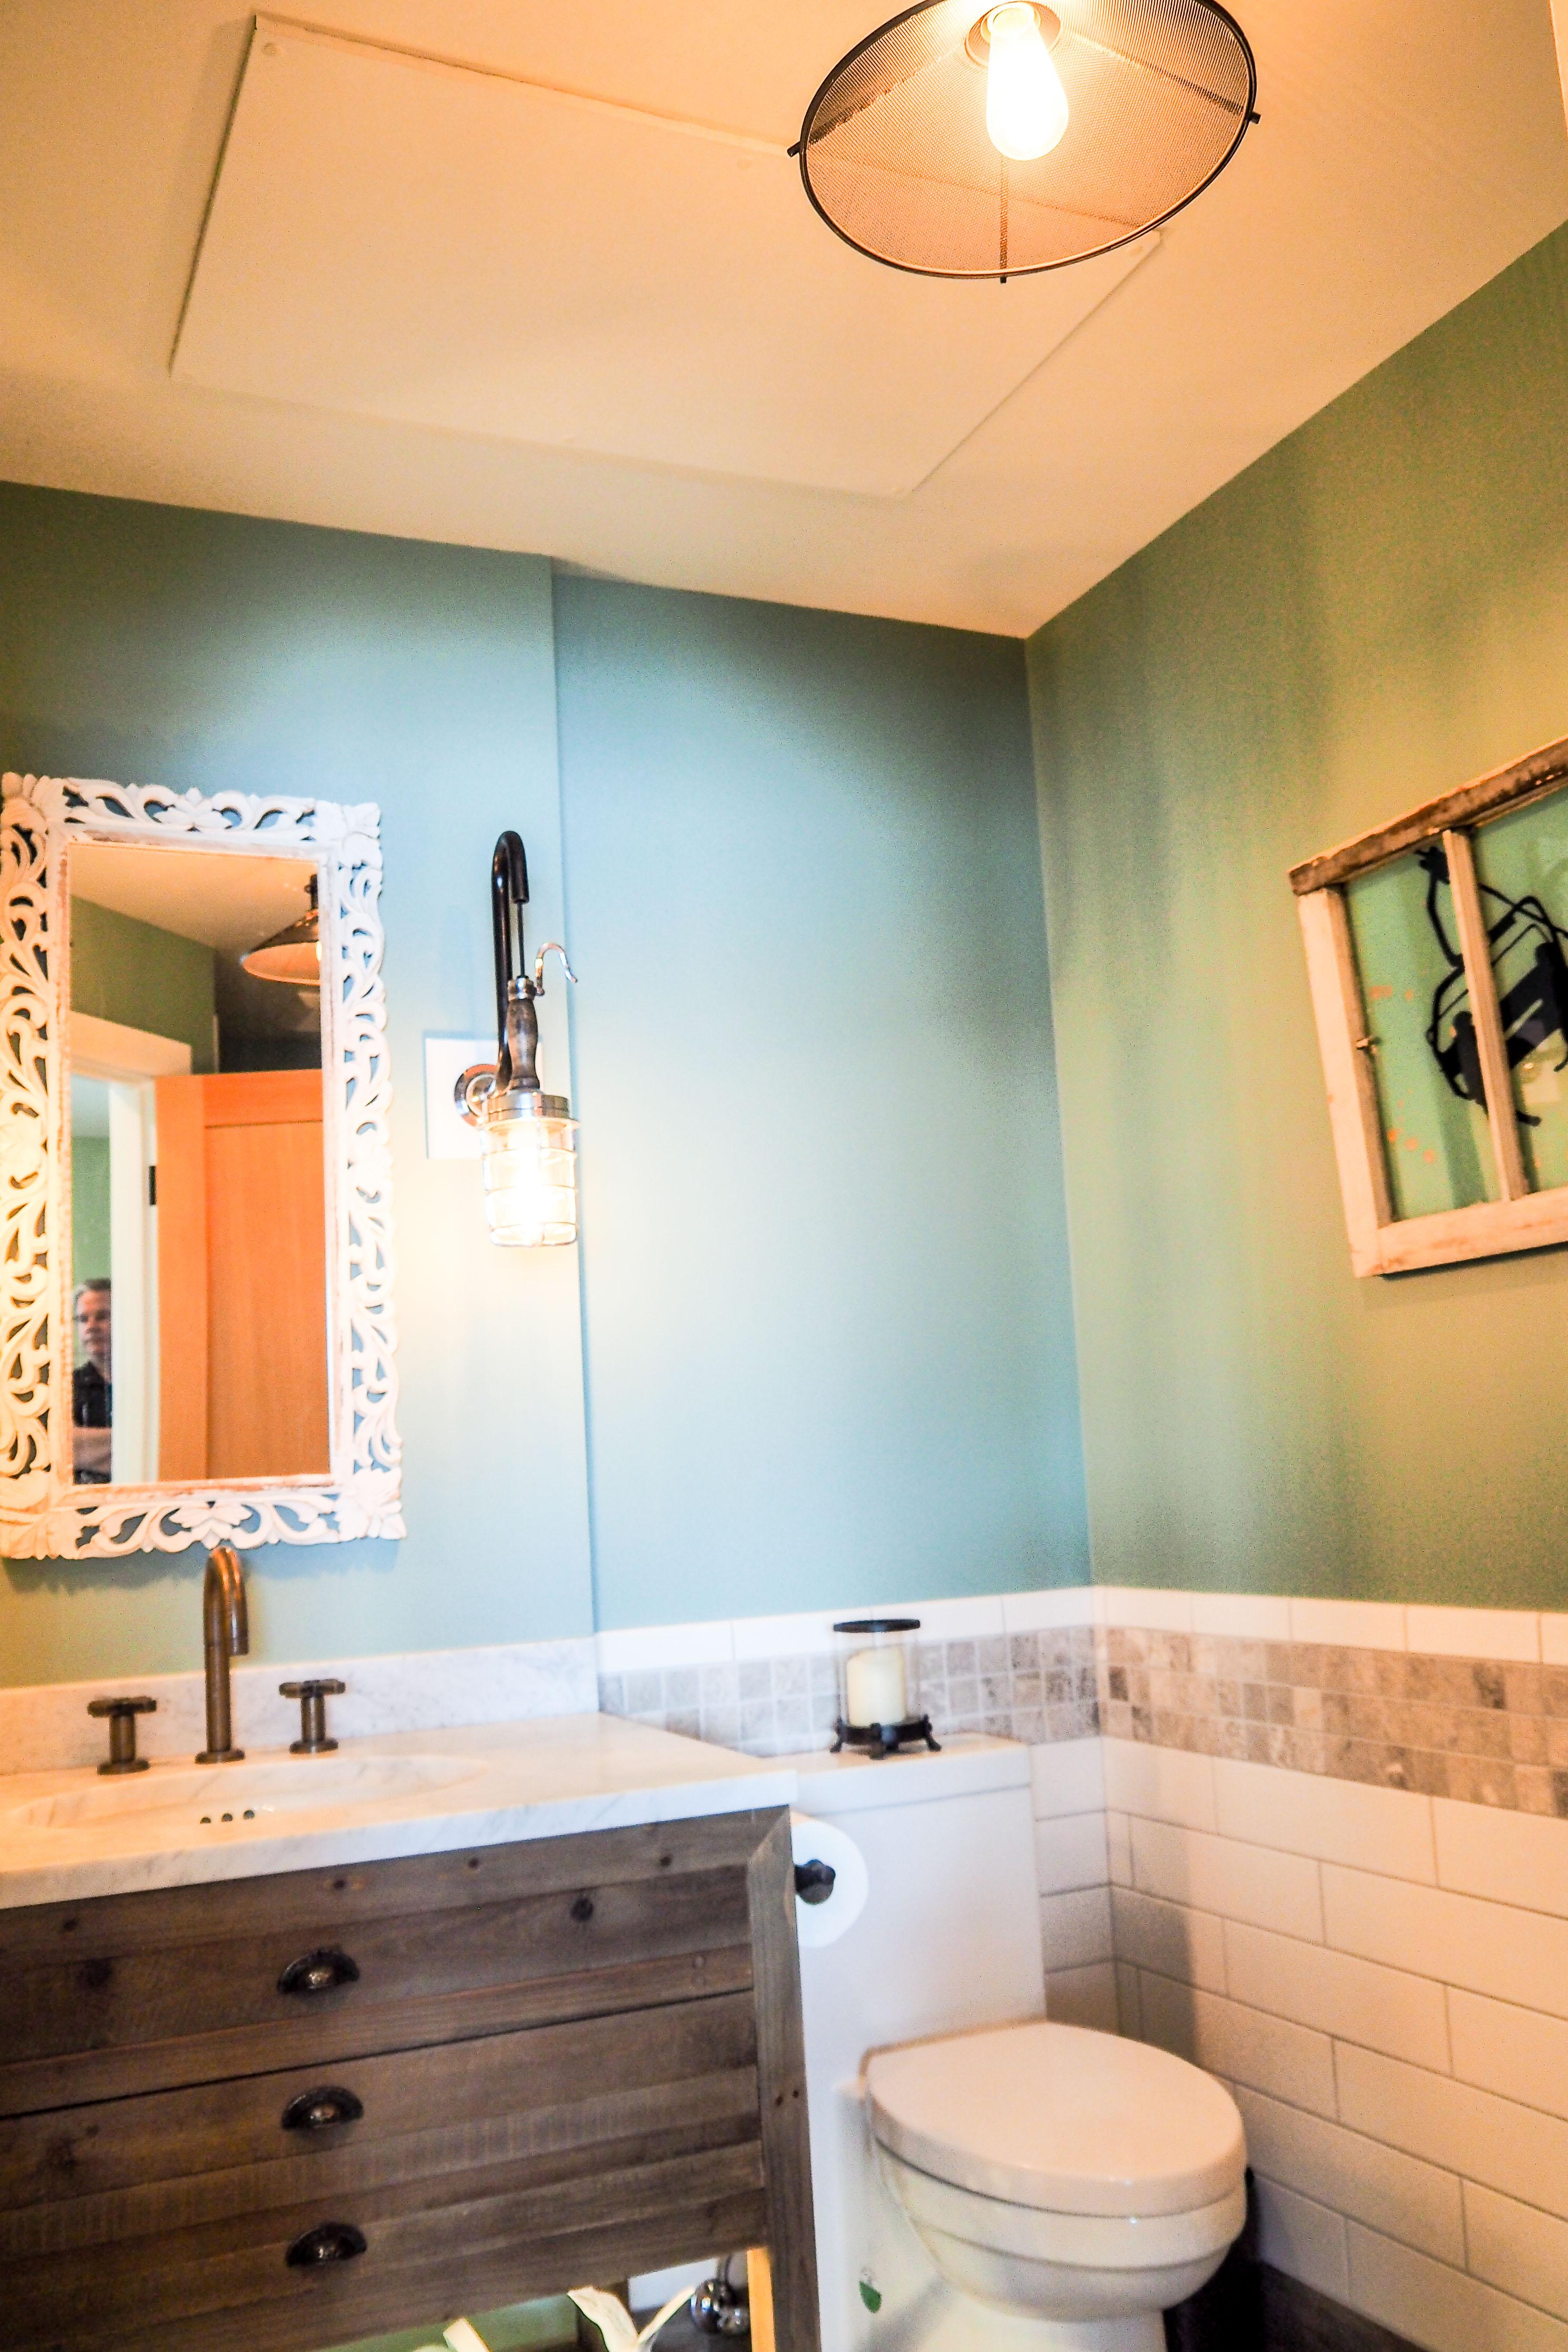 Ducoterra SolaRay Far Infrared Panel in a Bathroom